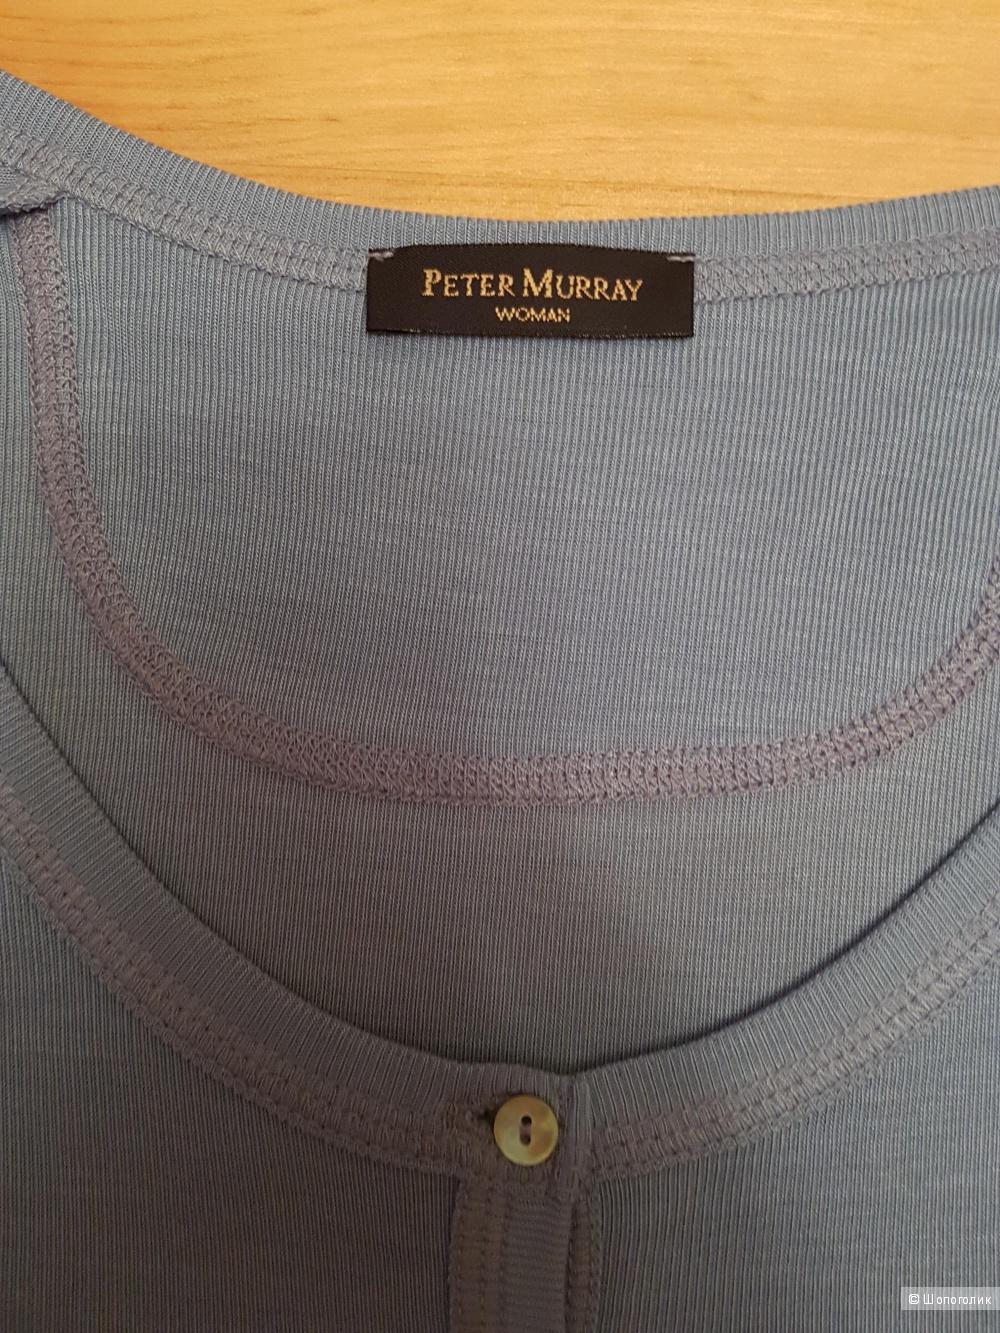 Блузка PETER MURREY, размер 42